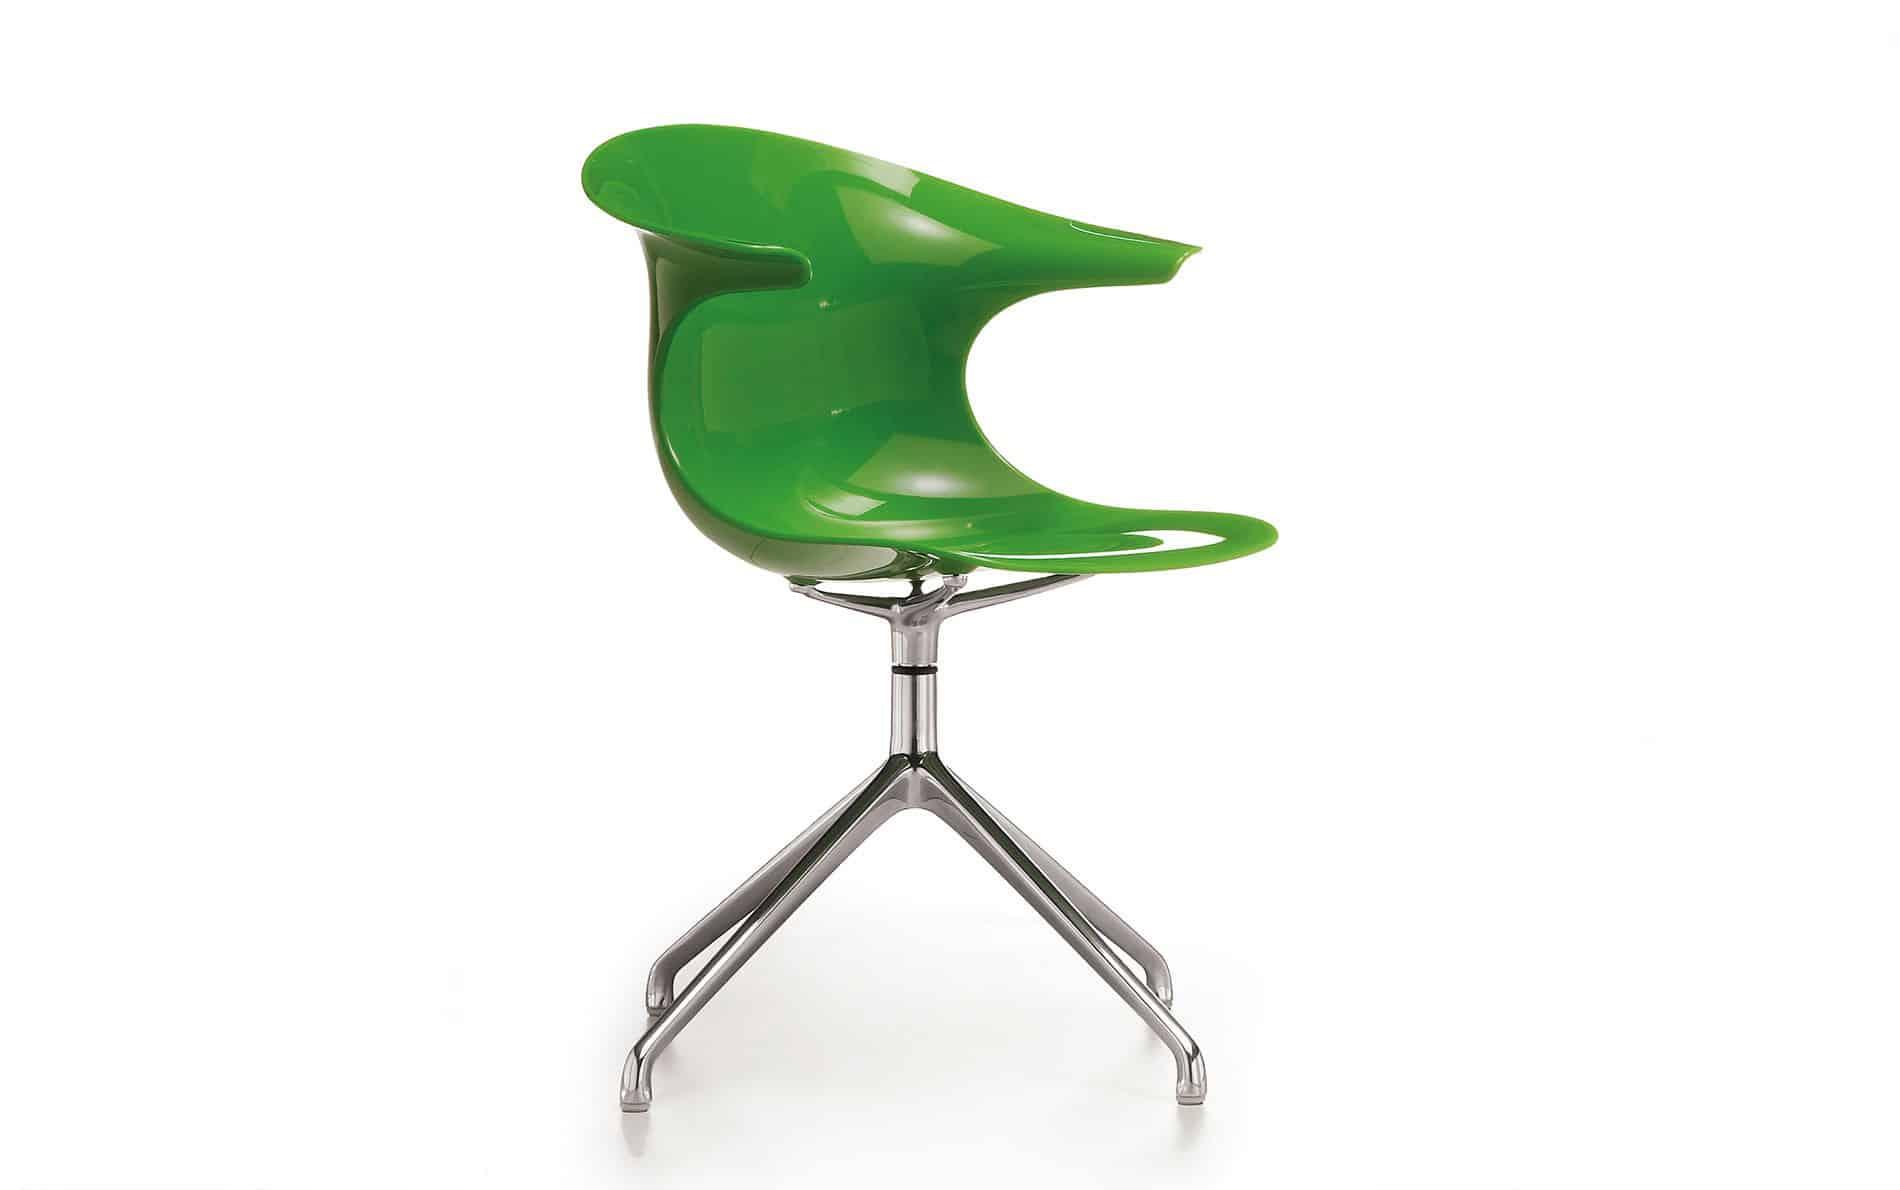 infiniti stuhl loop 3d 2er set walnuss preise und rabatt. Black Bedroom Furniture Sets. Home Design Ideas